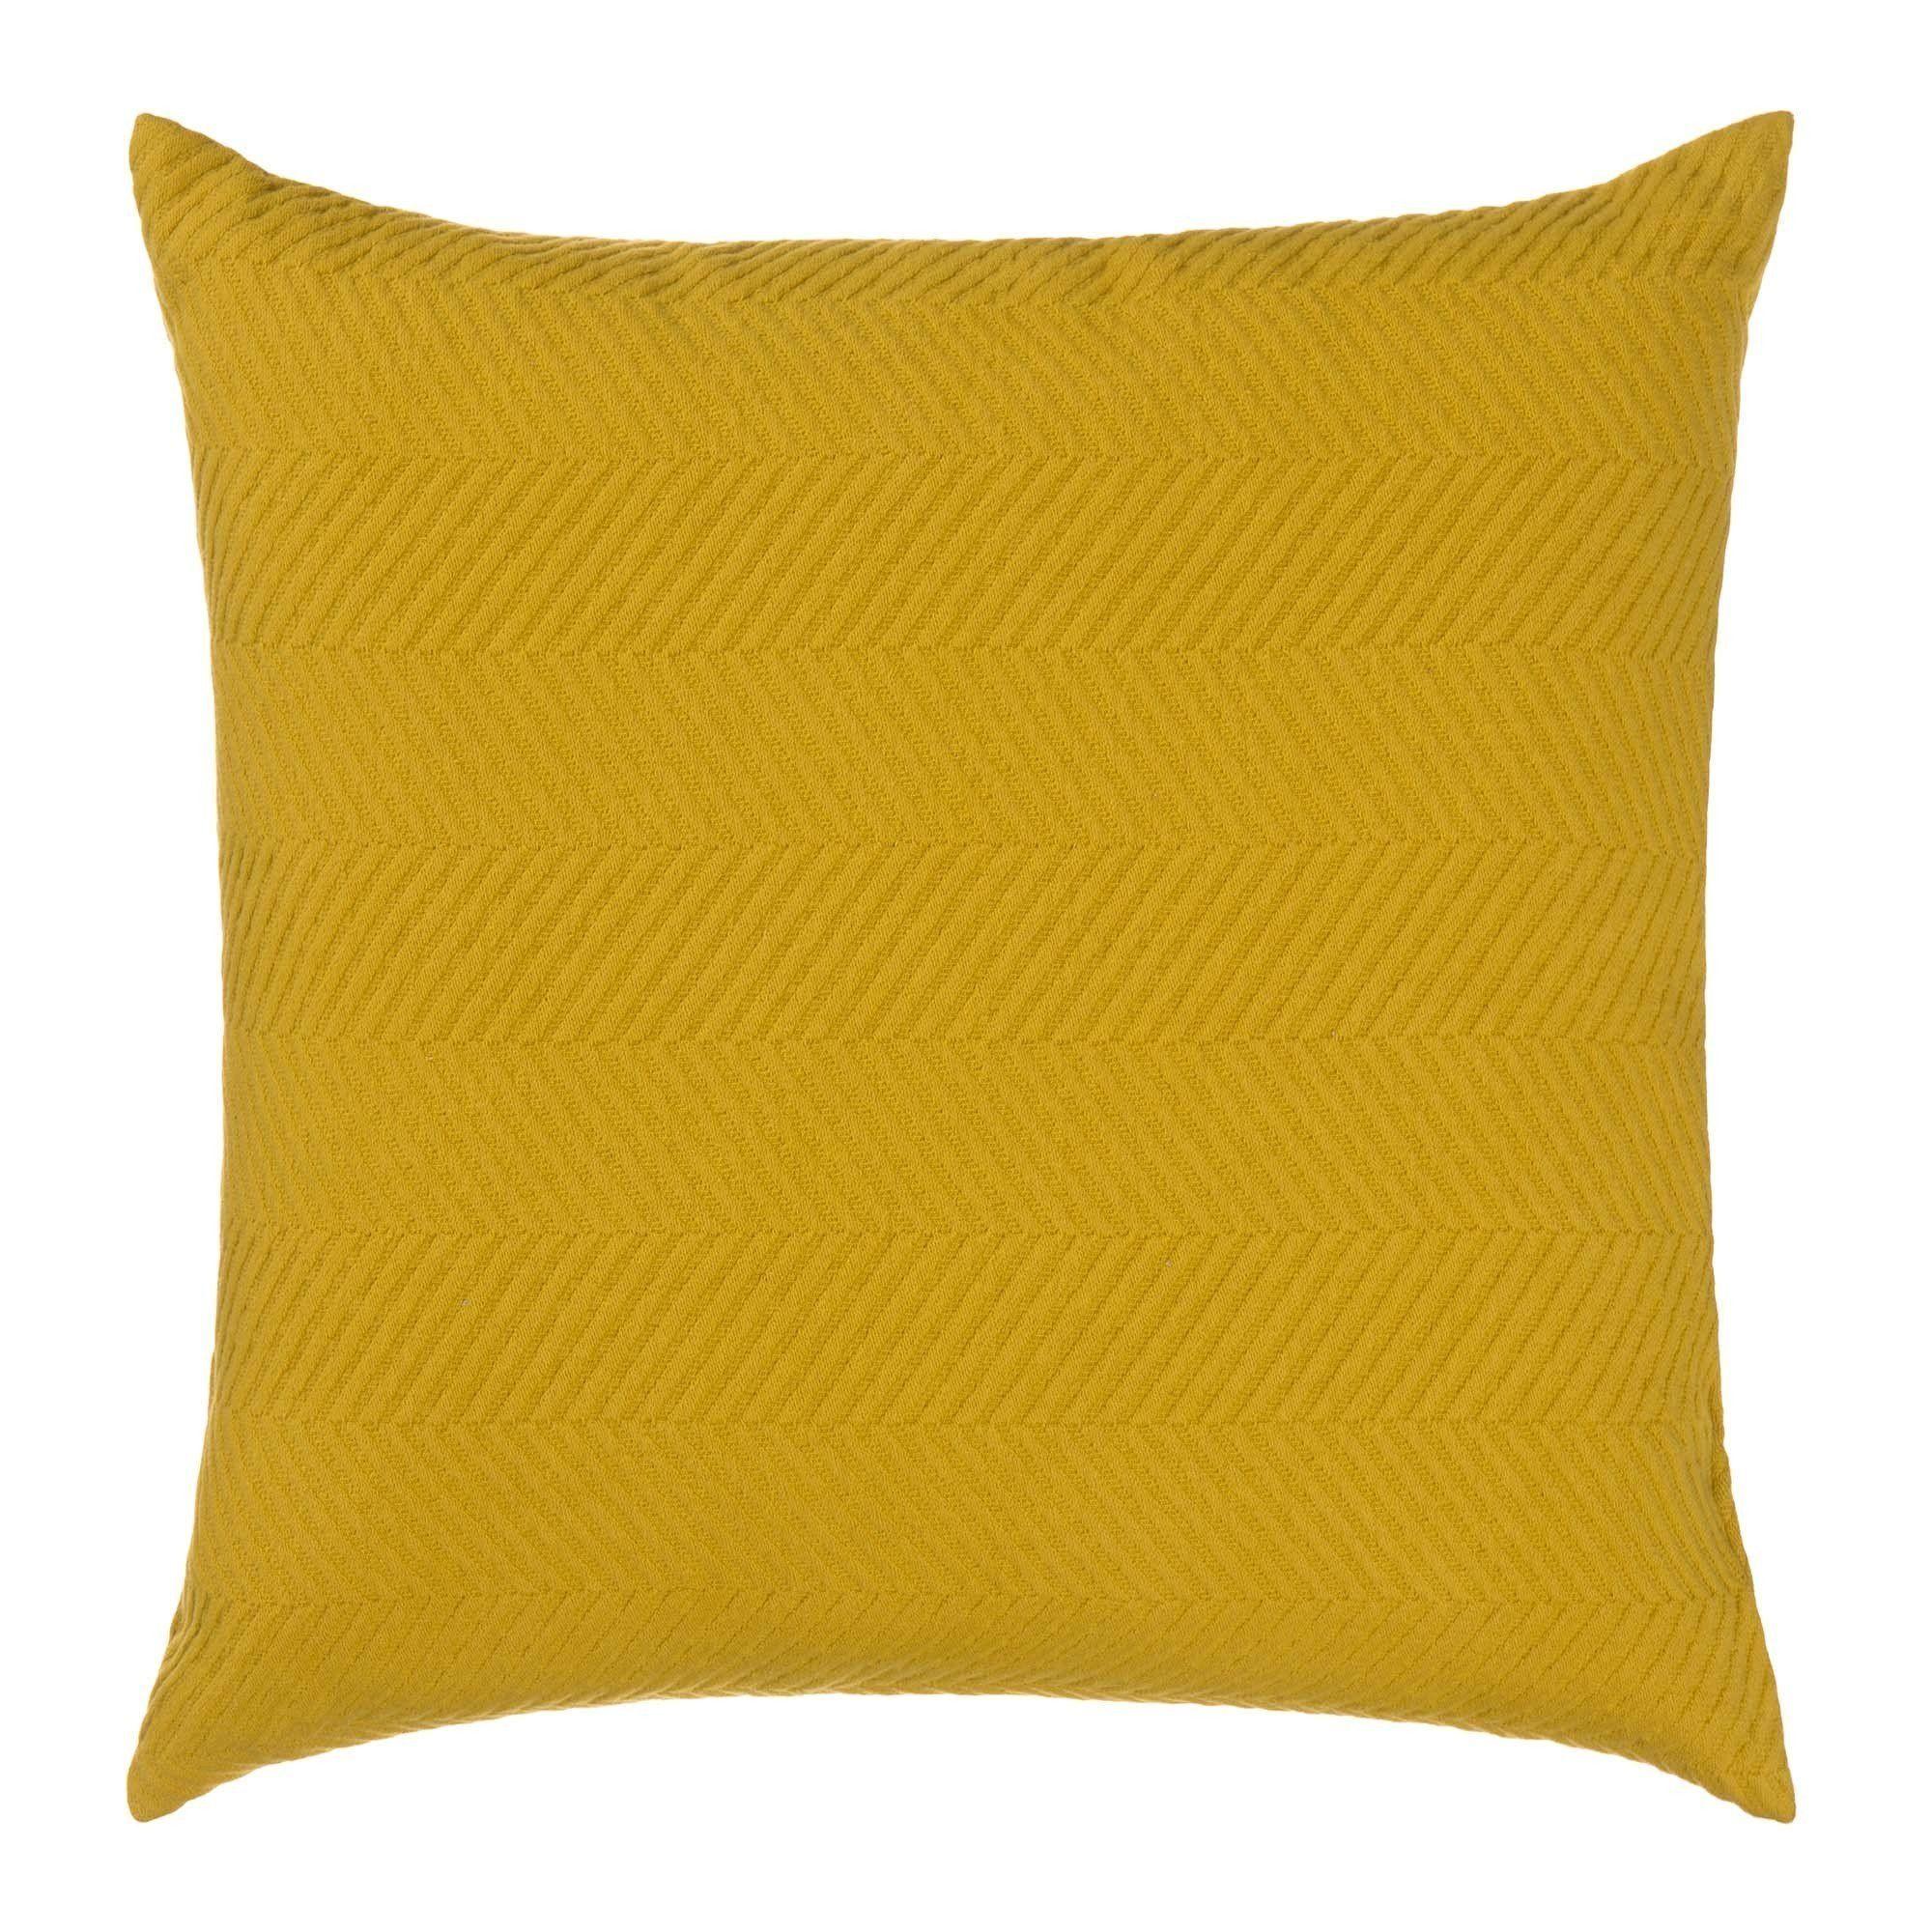 Kissenhulle Lixa Senfgelb 50x50 Cm Senfgelb Kissen Gelb Und